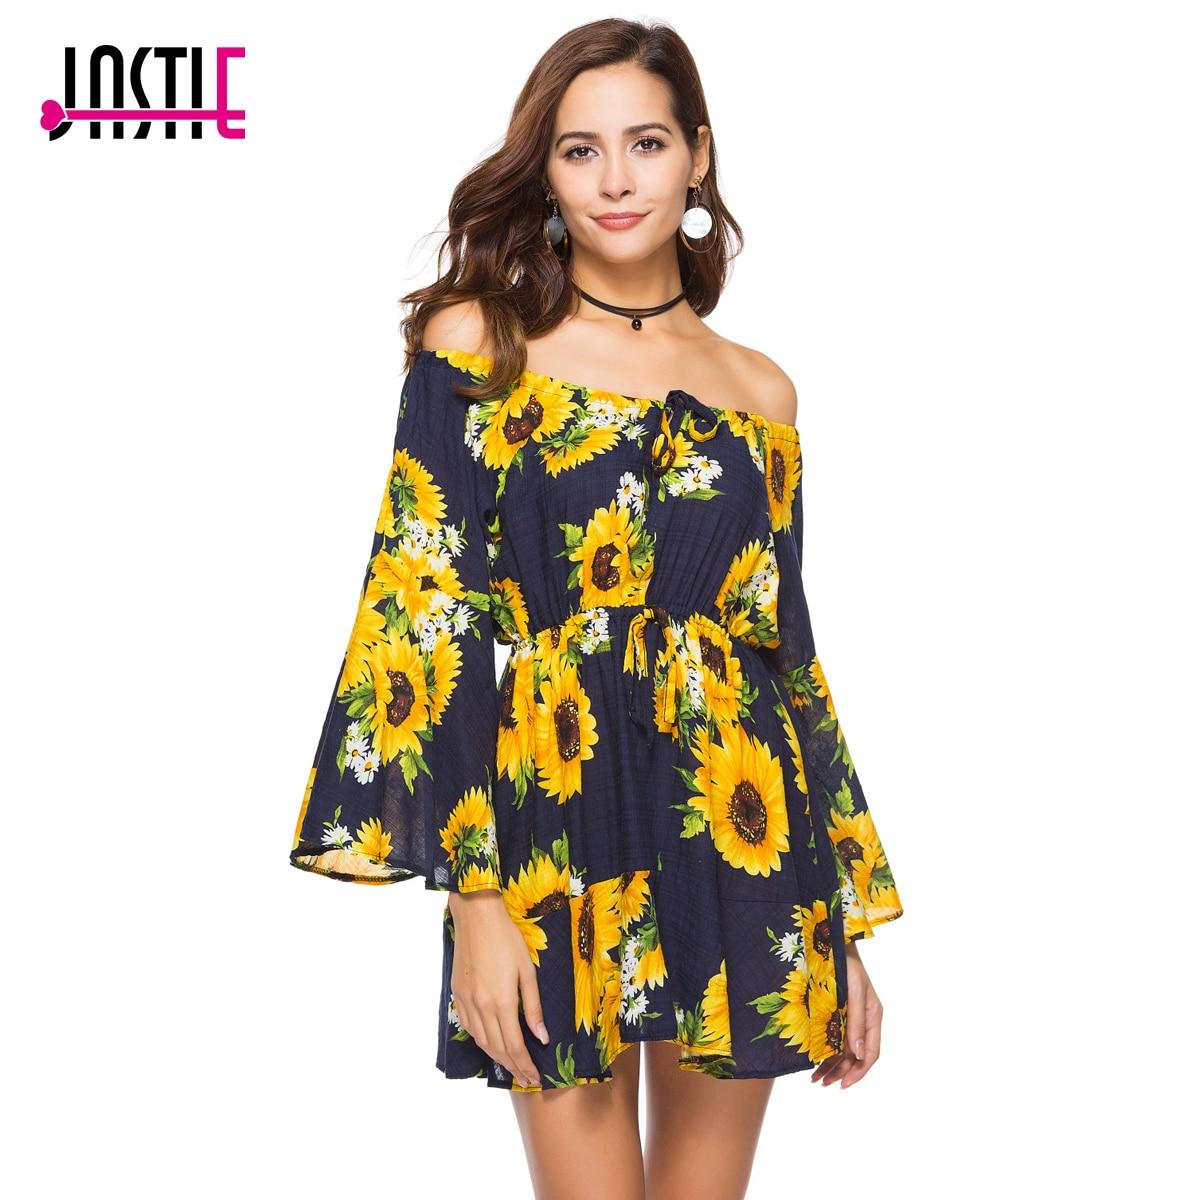 556e9b420007 Jastie Slash Neck with Tie Sexy Mini Dress Sunflower Print Summer Dress  Bohemia People Hippie Beach Dresses 2018 Women Vestidos